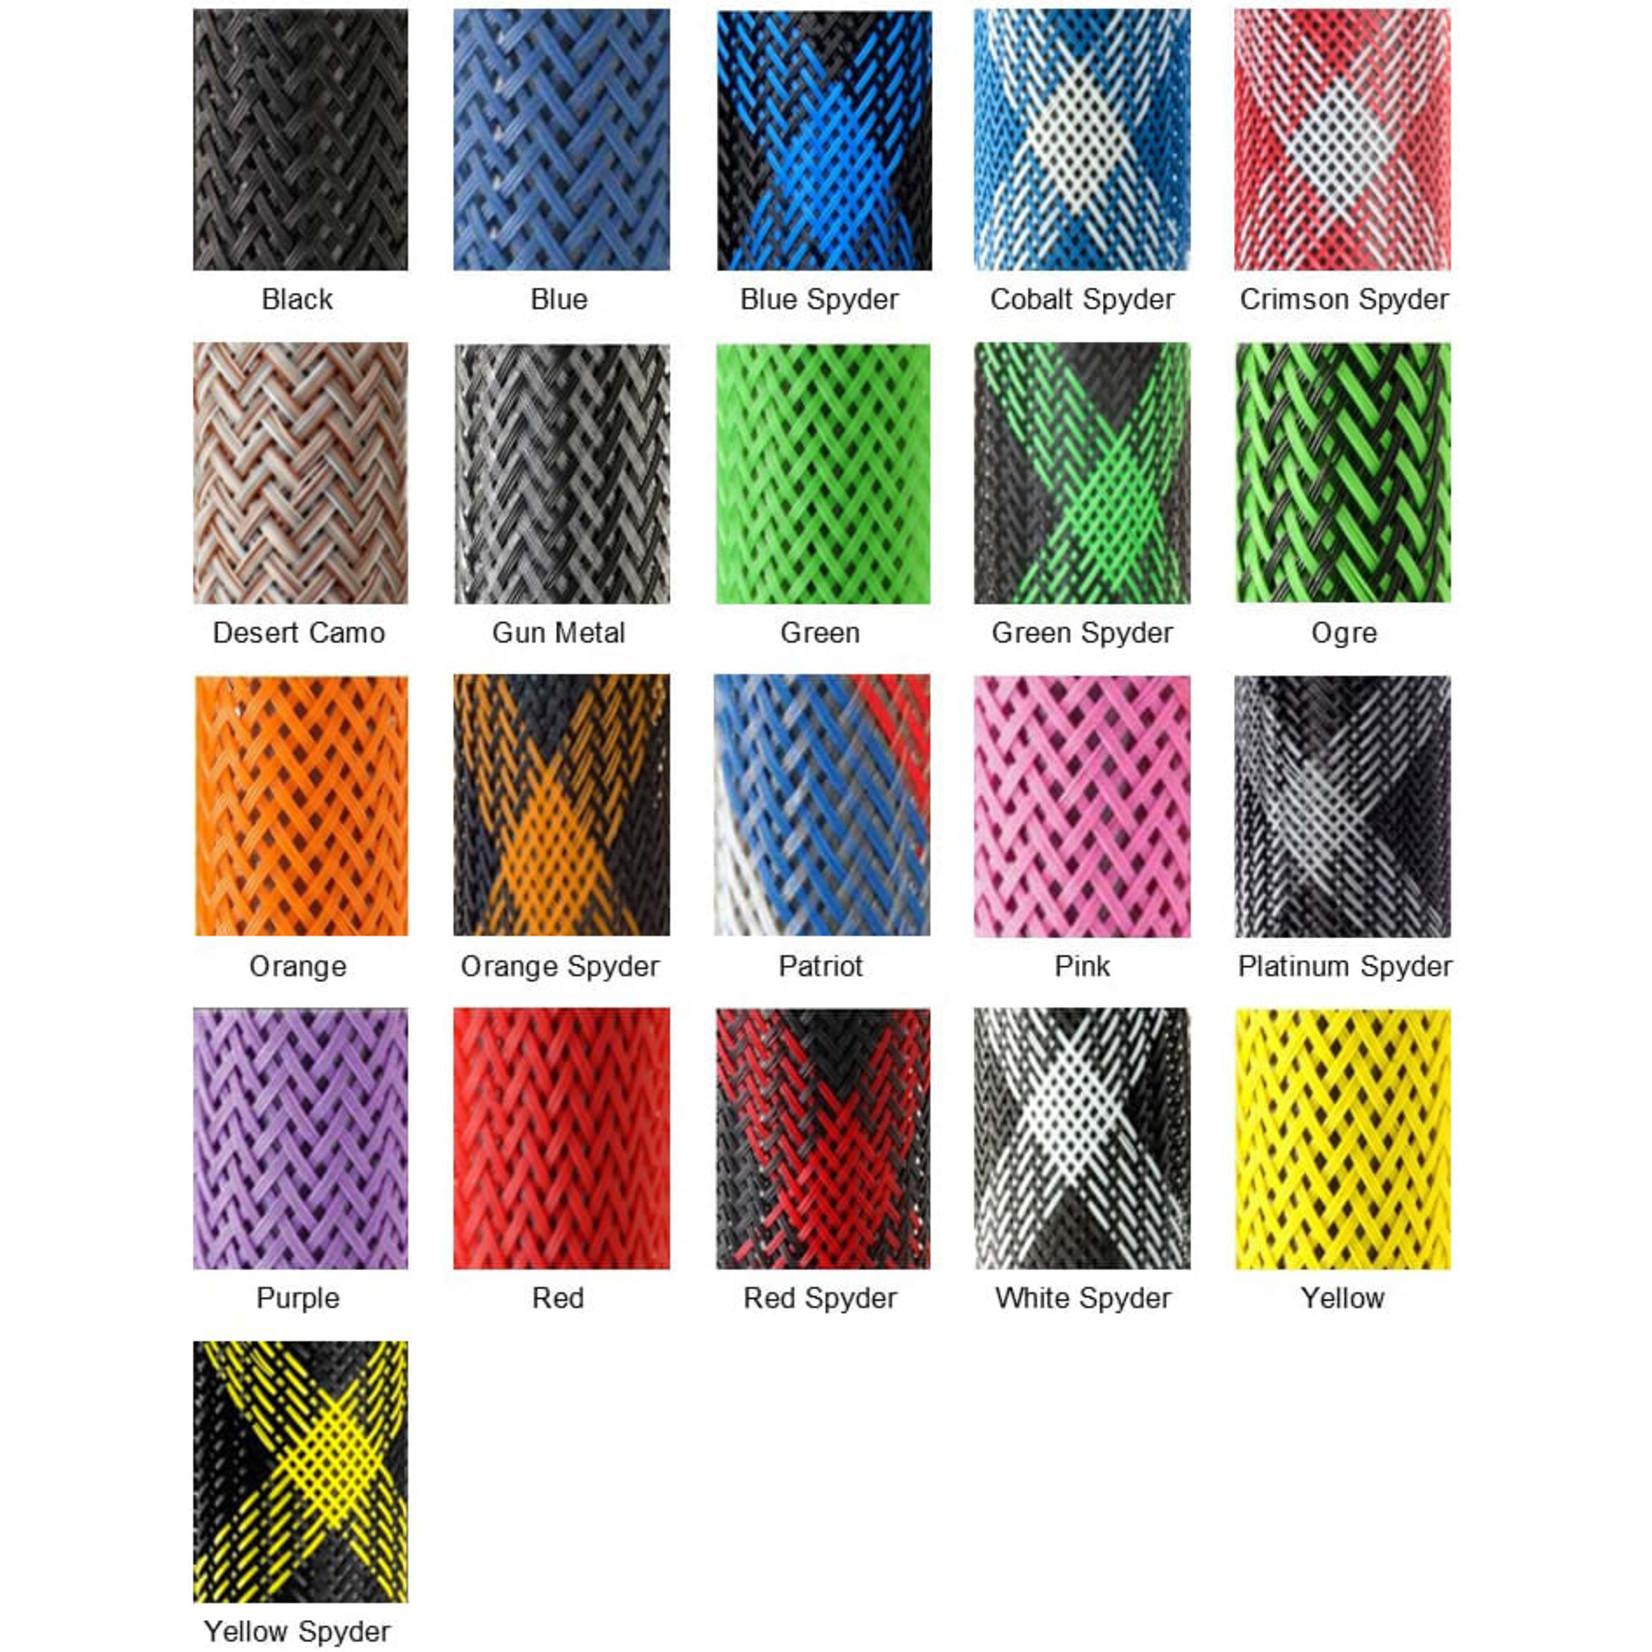 Rod Glove Casting Rod Glove • Standard 5.25' • Fits Rods 6.5' - 7.5'